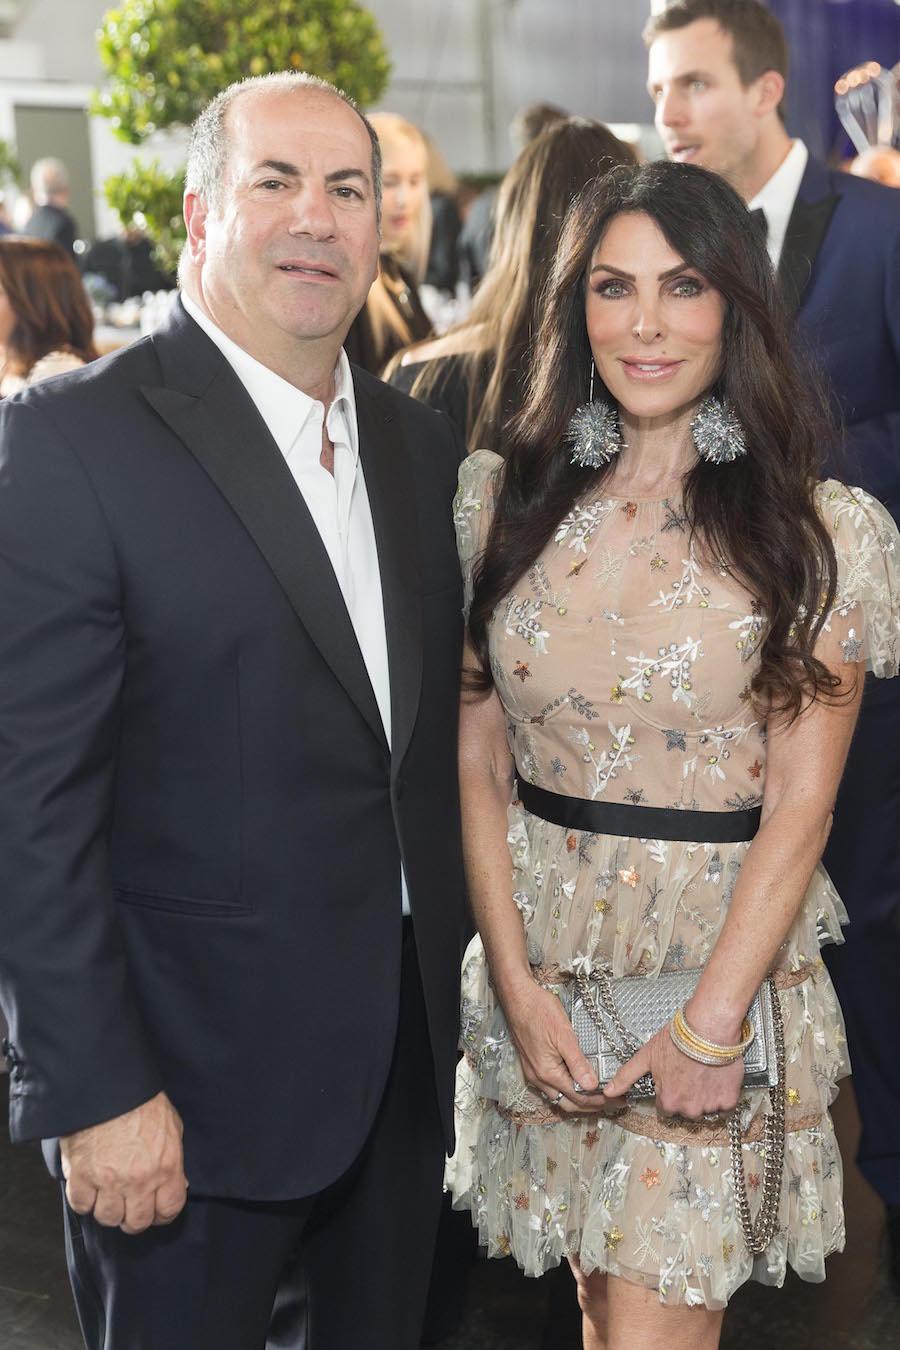 Todd Zabella and Lisa Zabelle